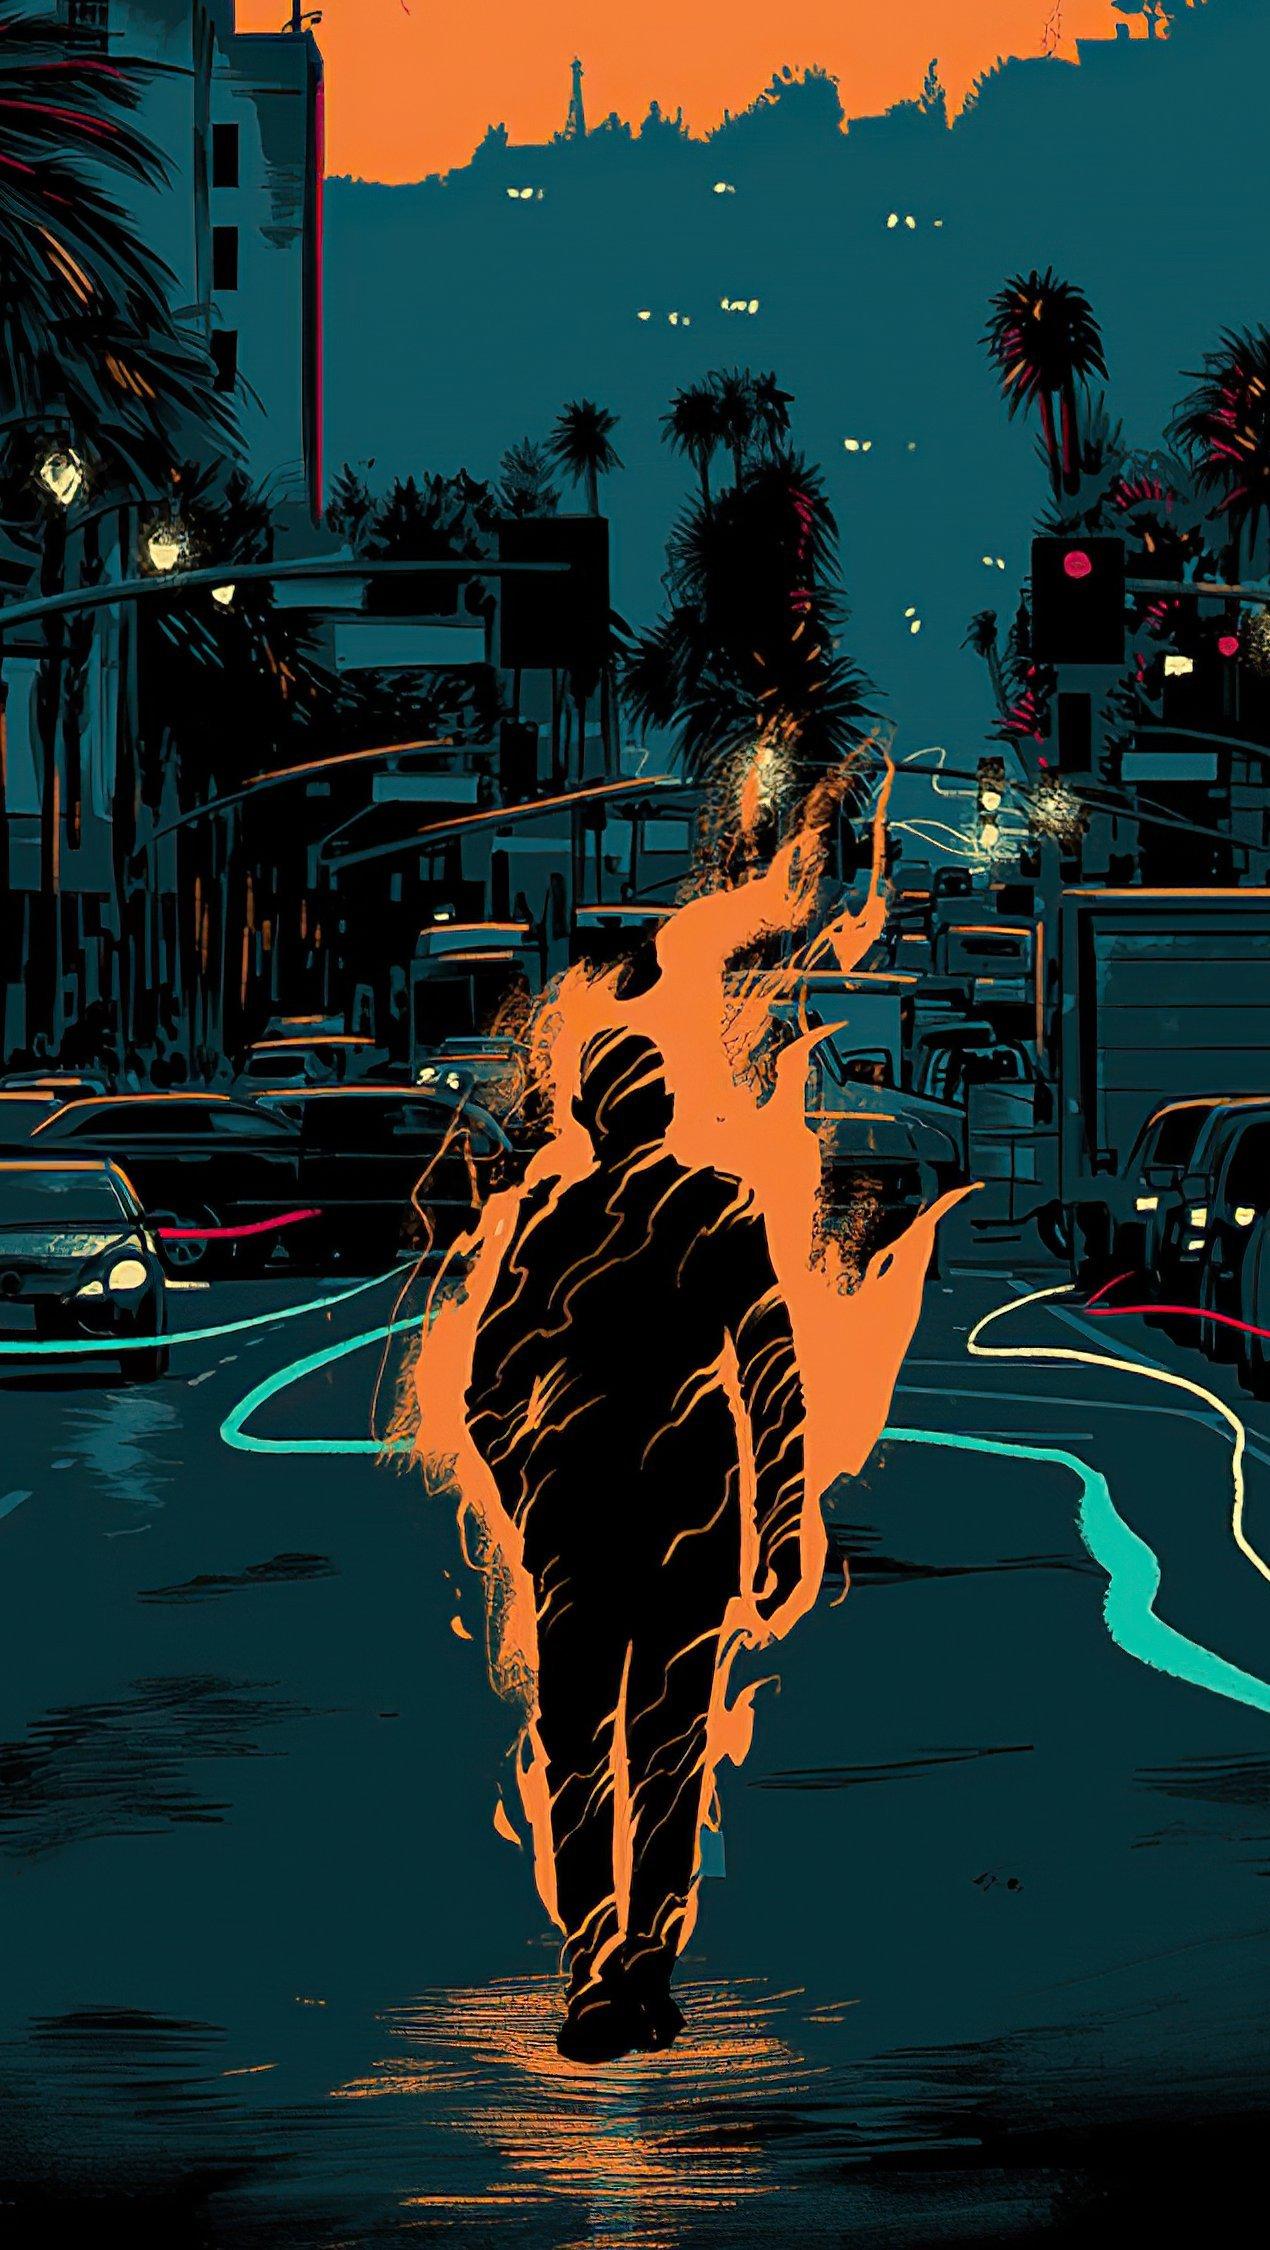 Fondos de pantalla Hombre en fuego Artwork Vertical